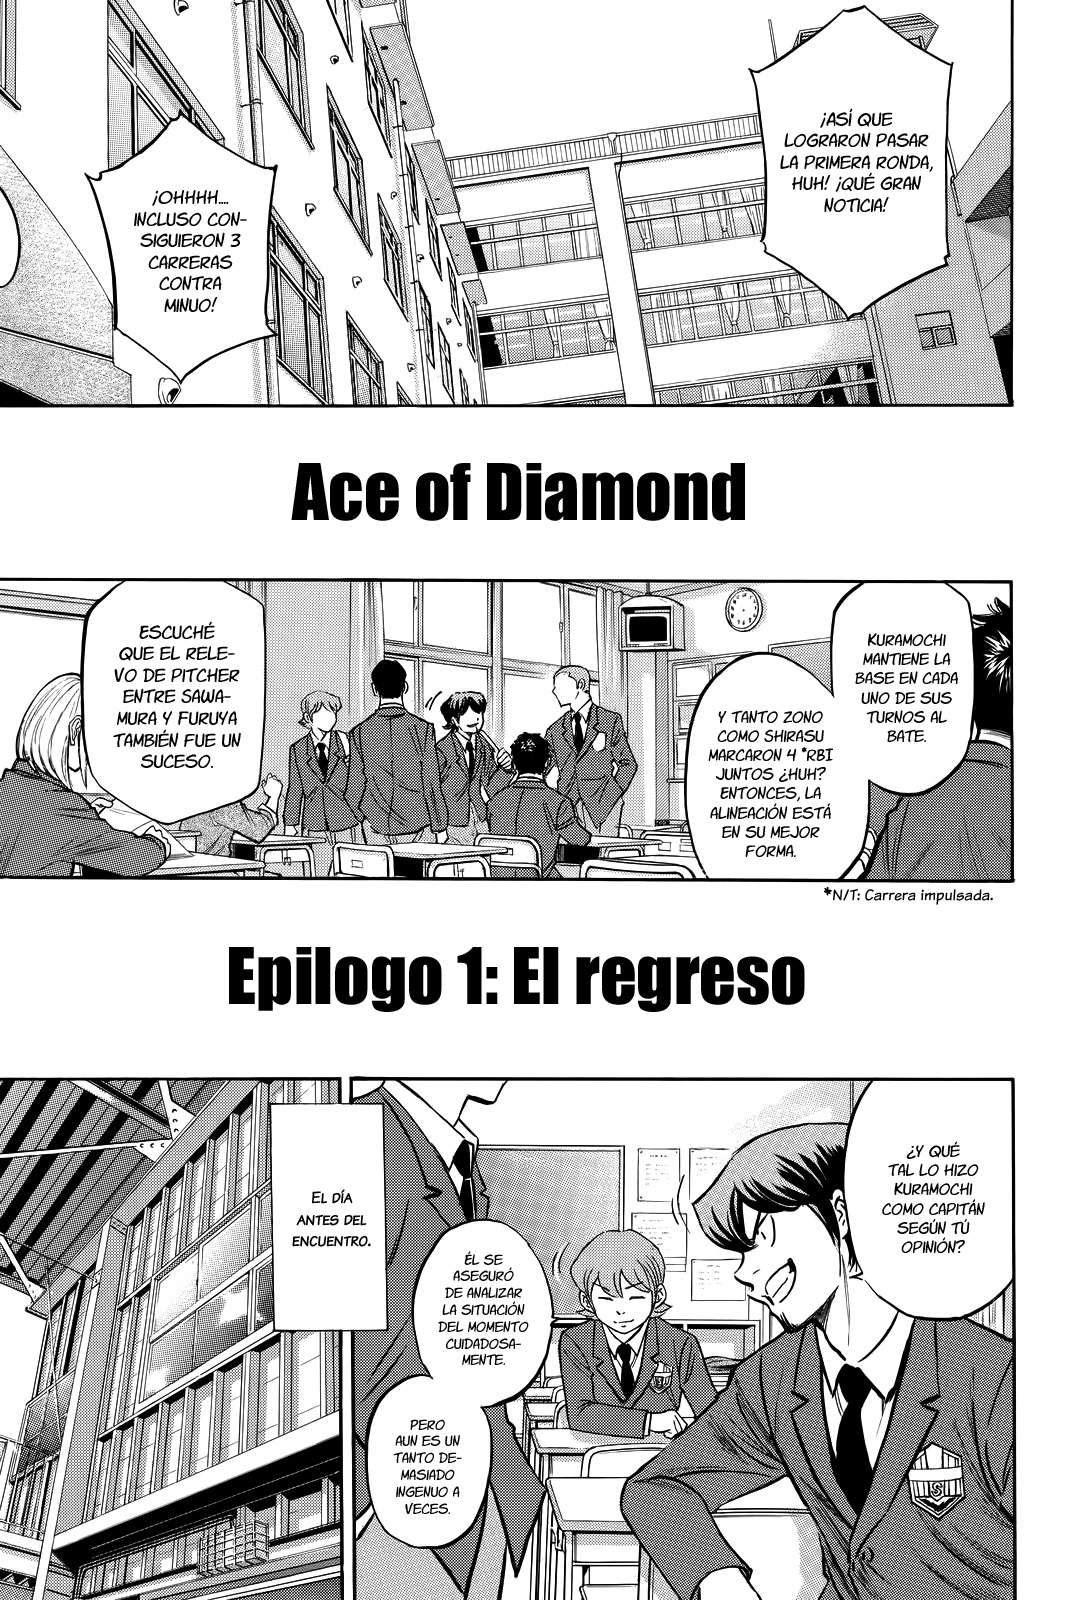 http://c5.ninemanga.com/es_manga/24/1752/415738/e1415faa4cca7f05db92f1d66ce238e6.jpg Page 1